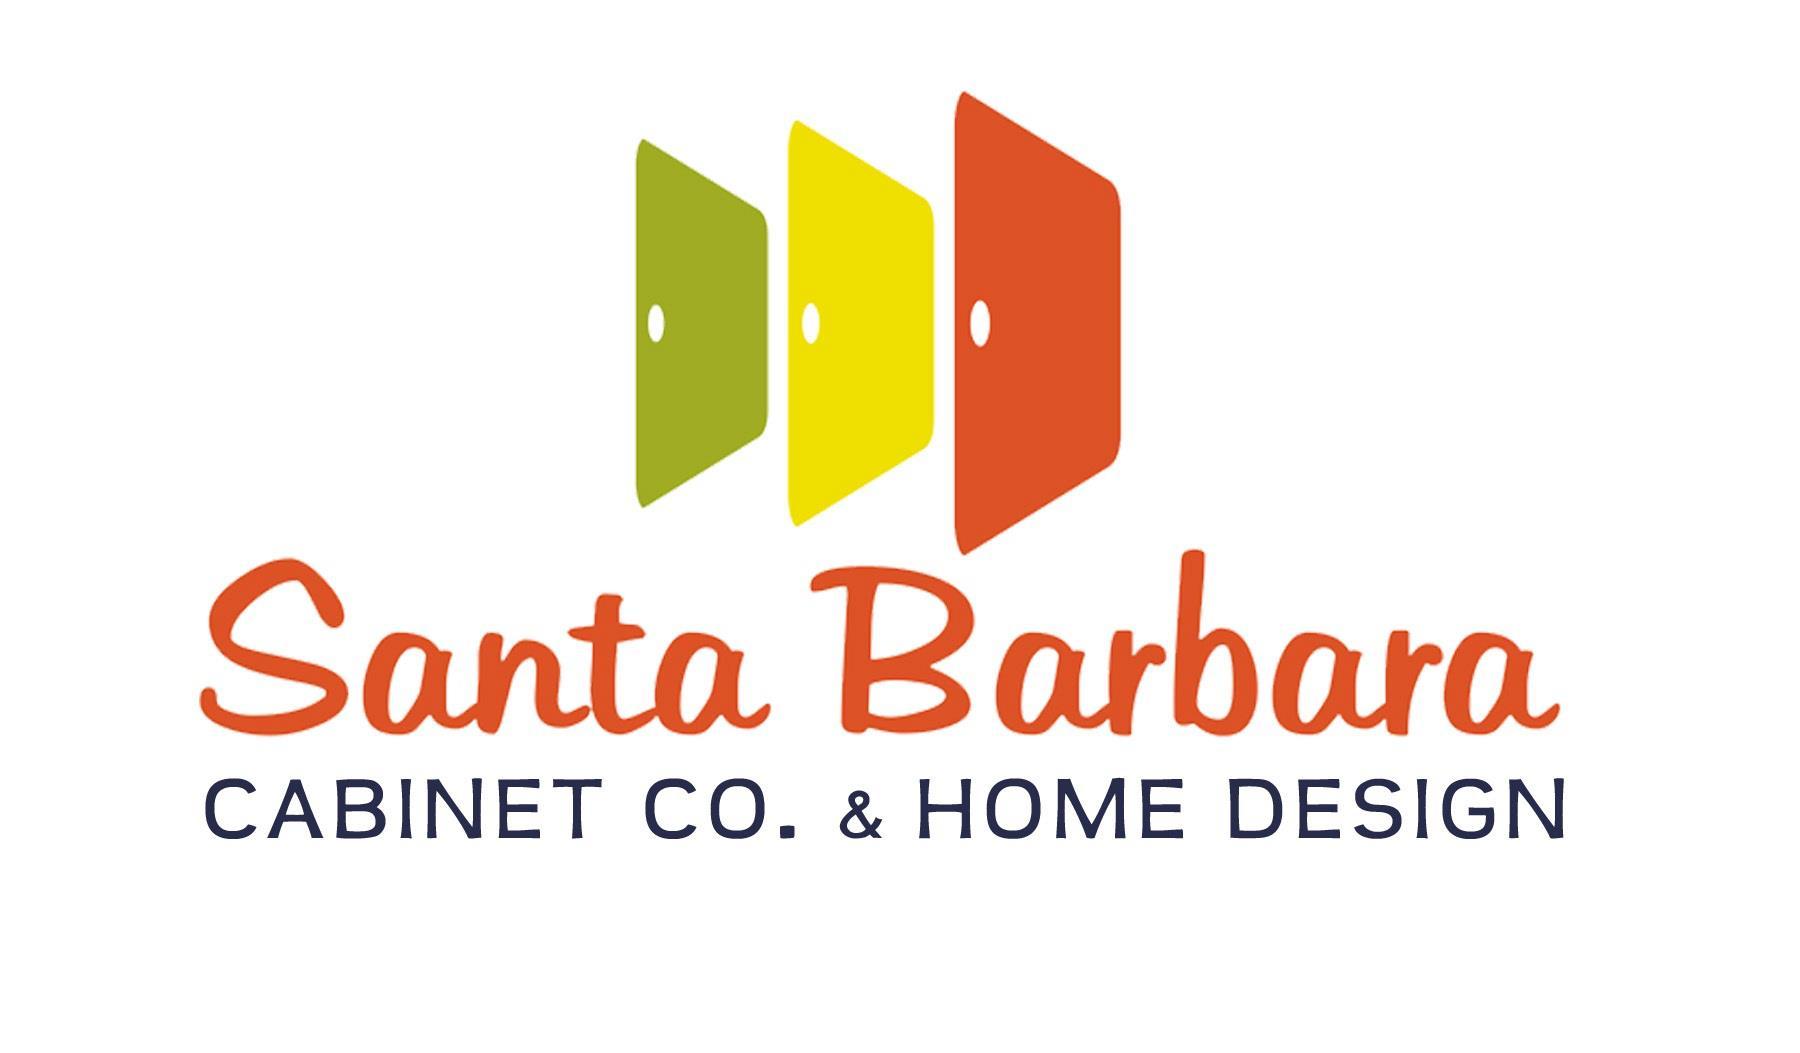 Santa Barbara Cabinet Company & Home Design logo